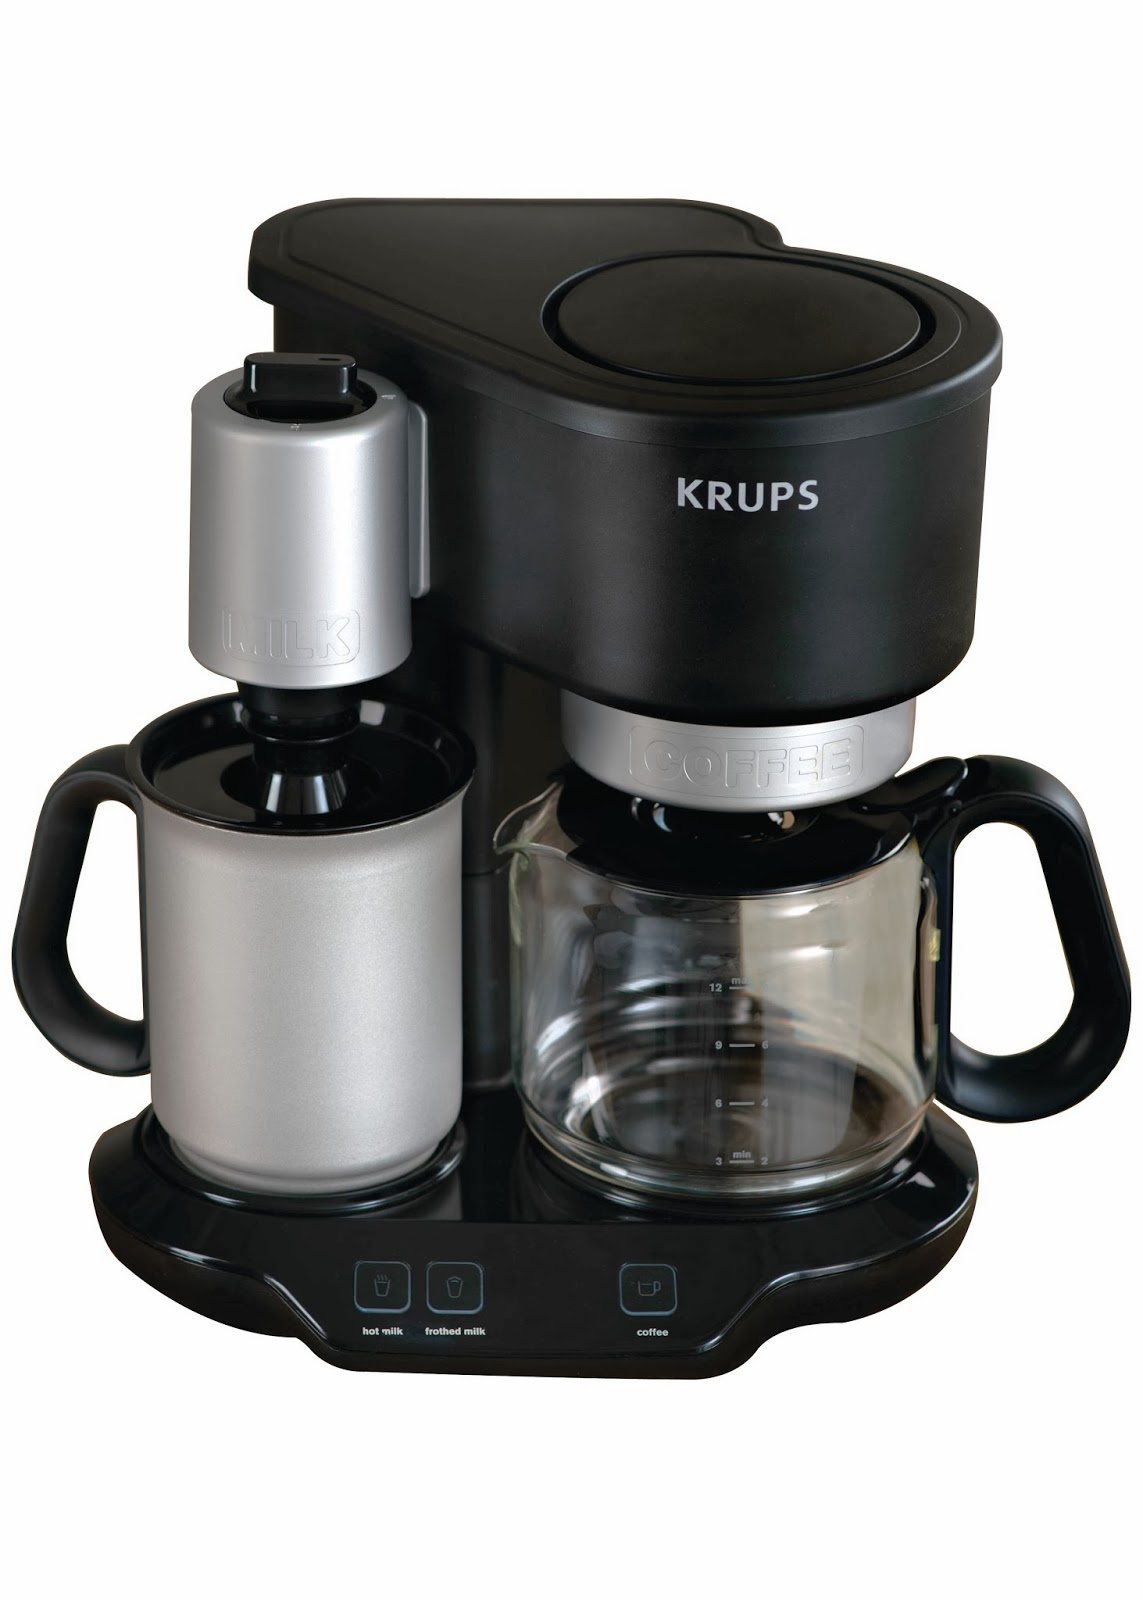 krups latteccino coffee maker